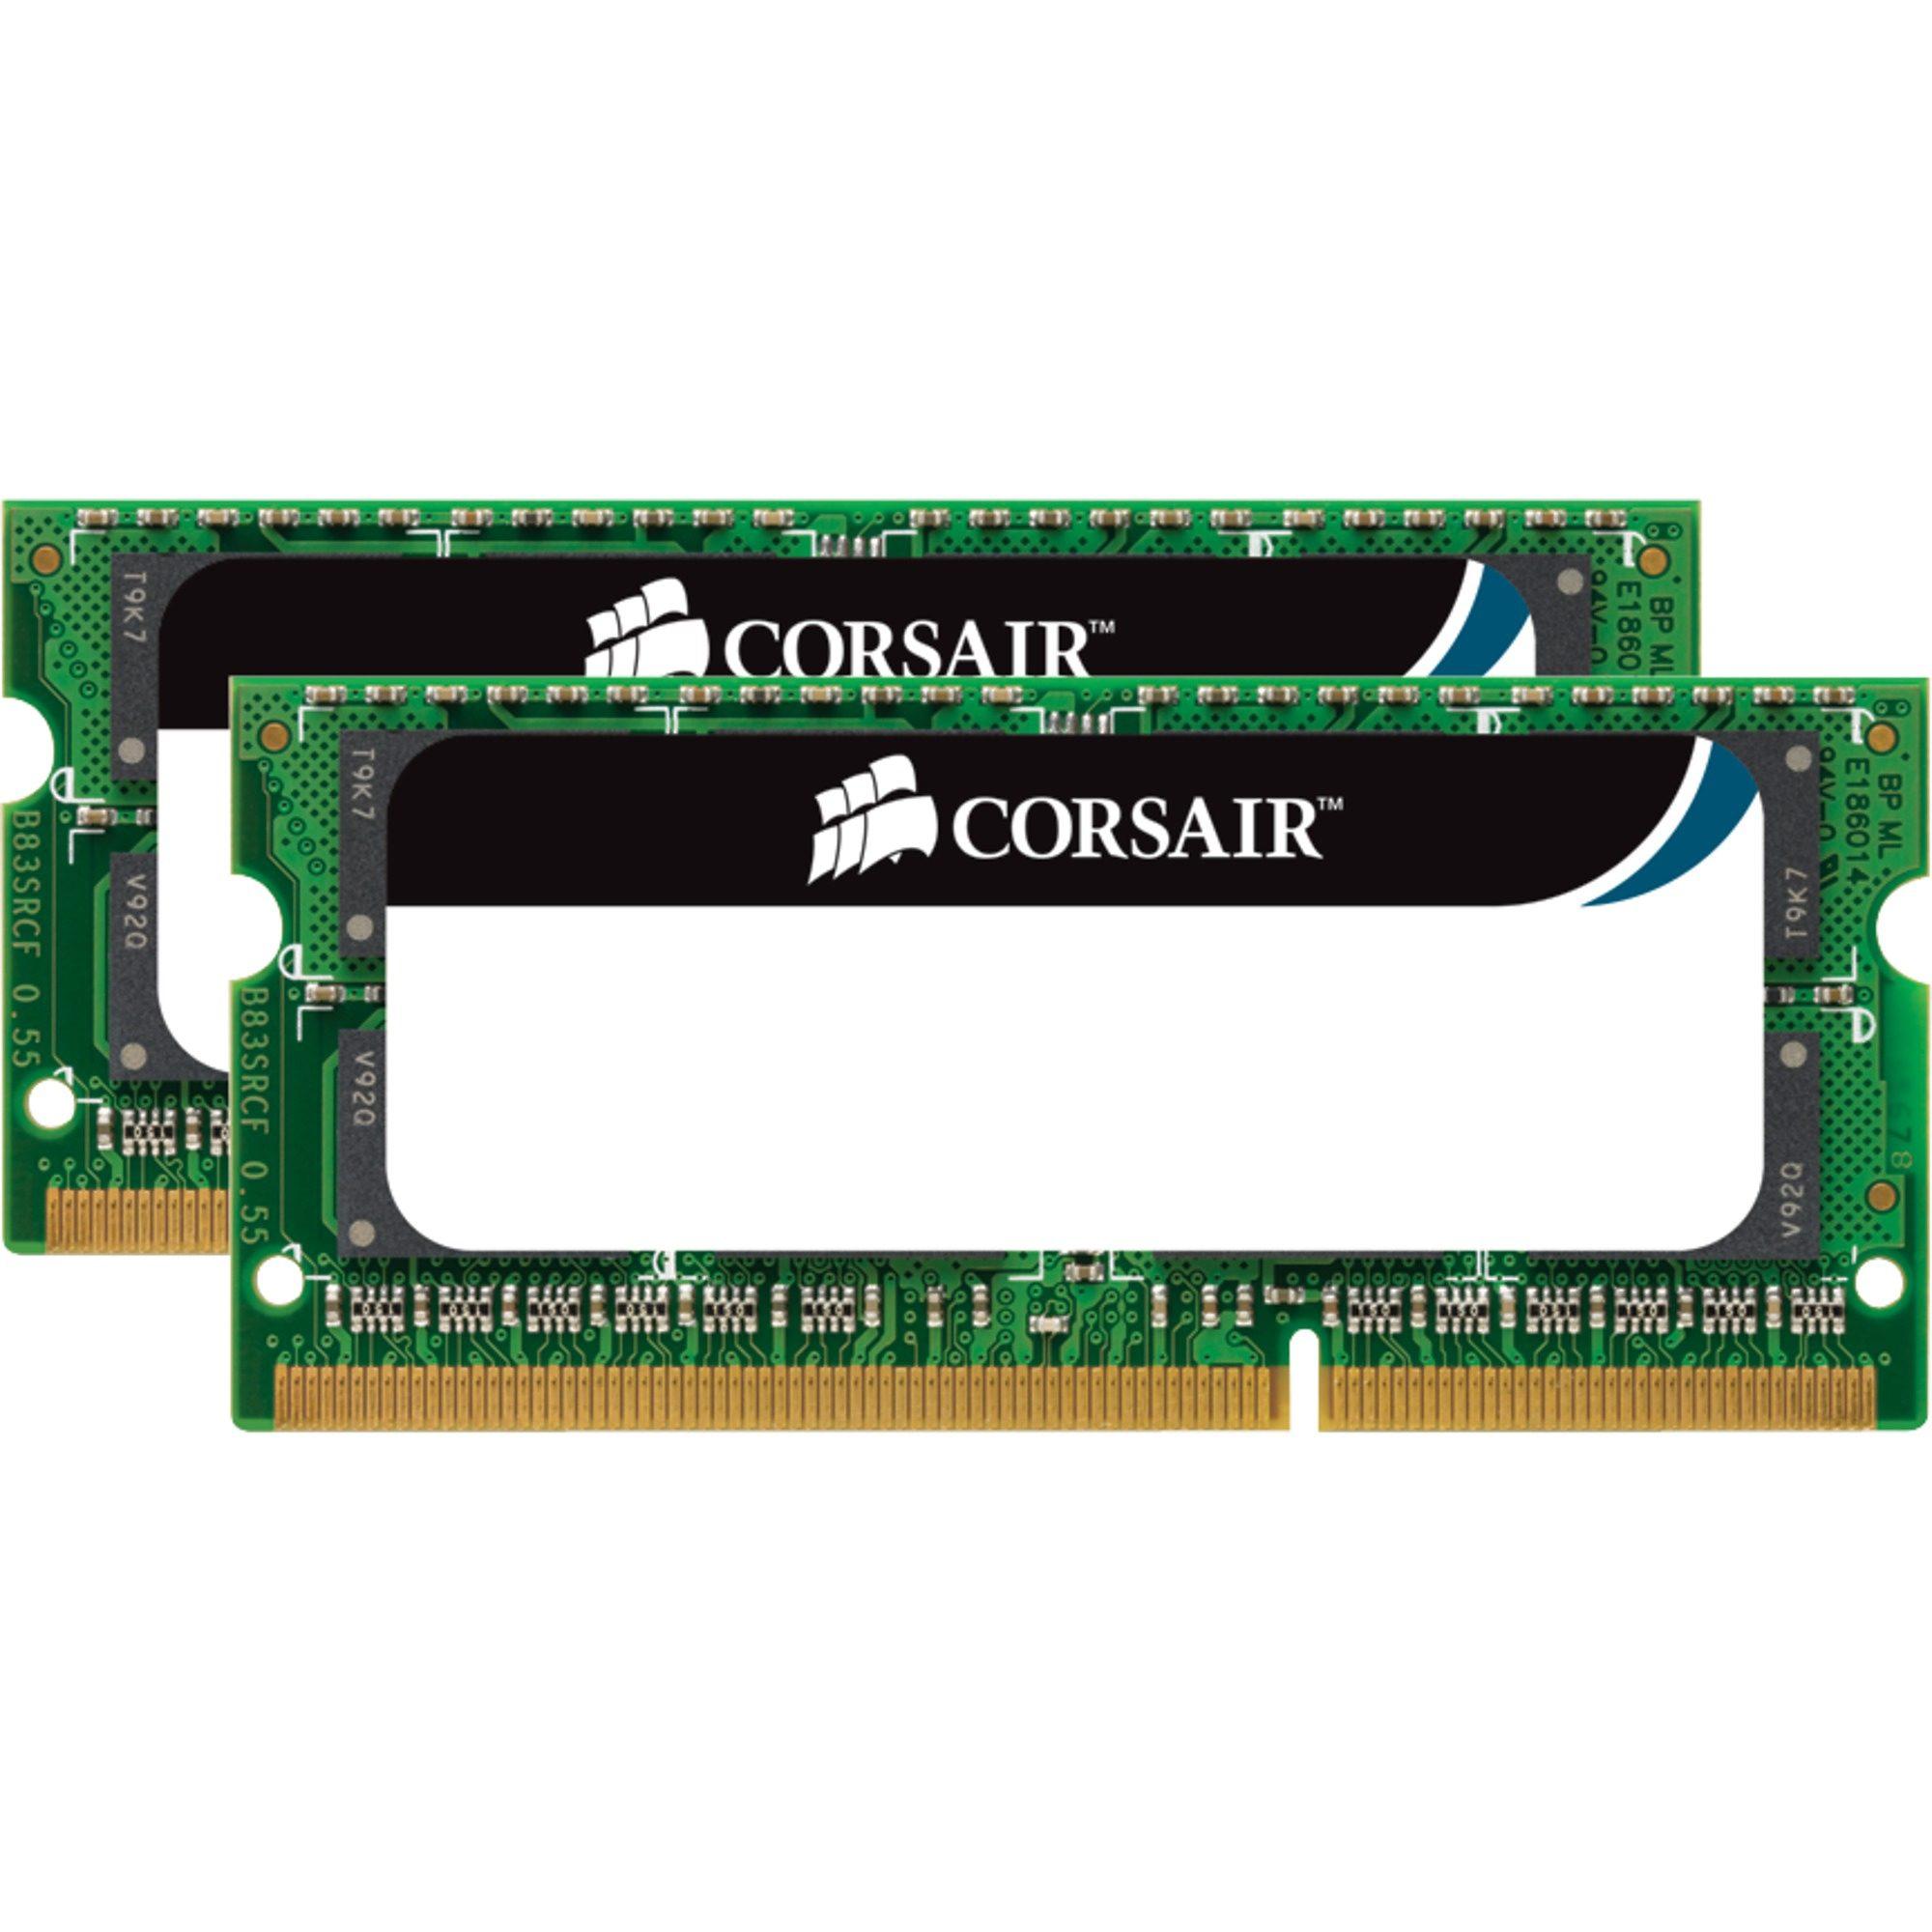 Corsair Arbeitsspeicher »SO-DIMM 8 GB DDR3-1066 Kit«